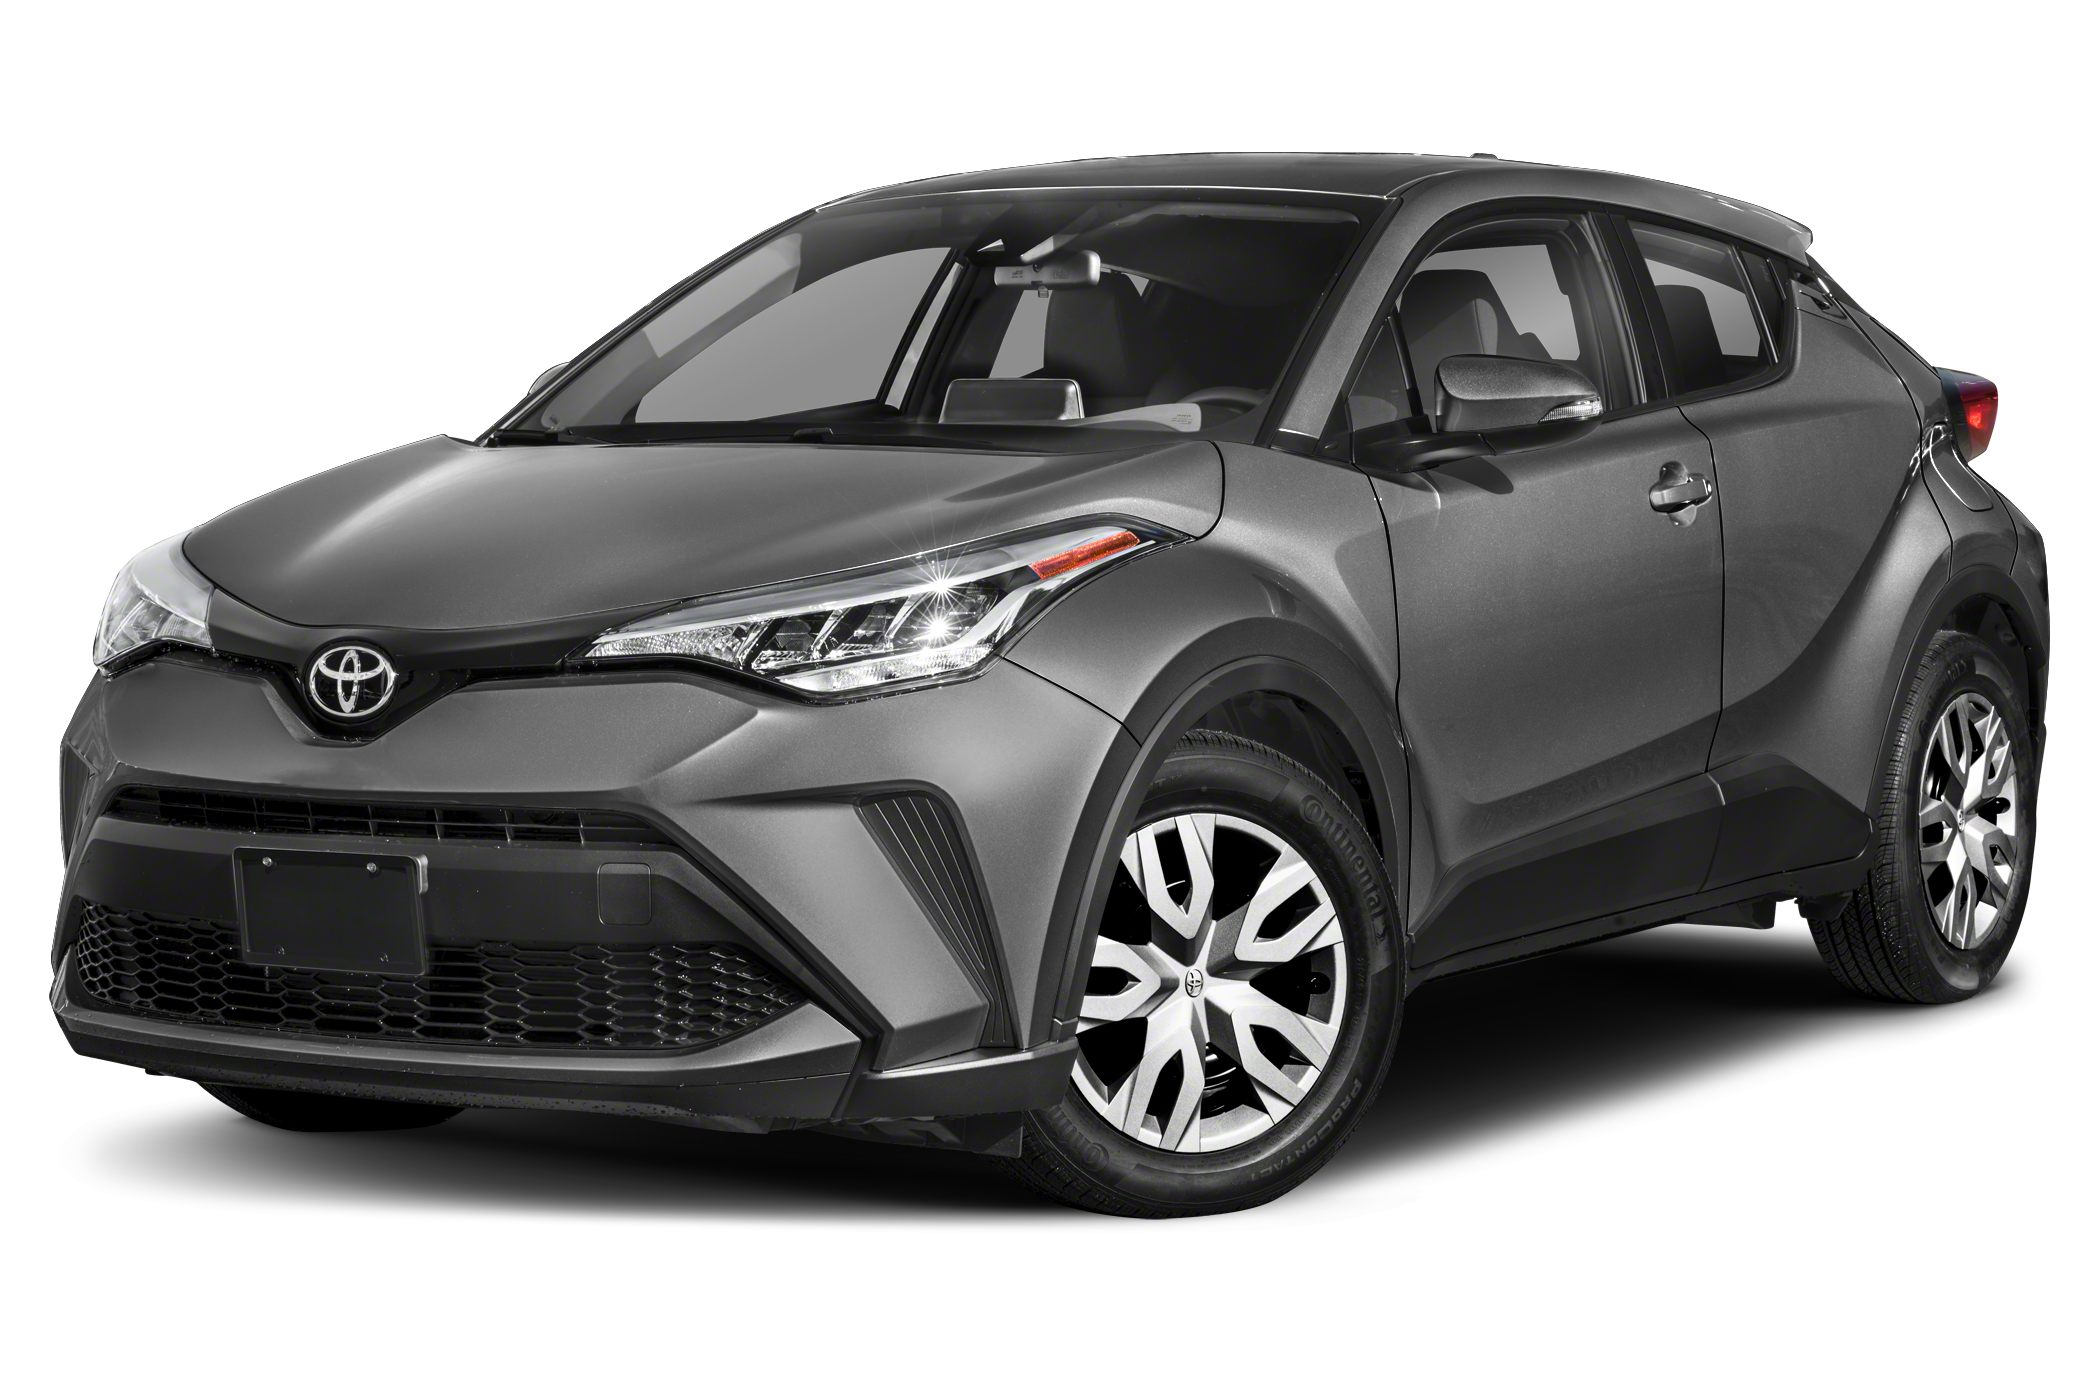 Kelebihan Toyota Chr Perbandingan Harga